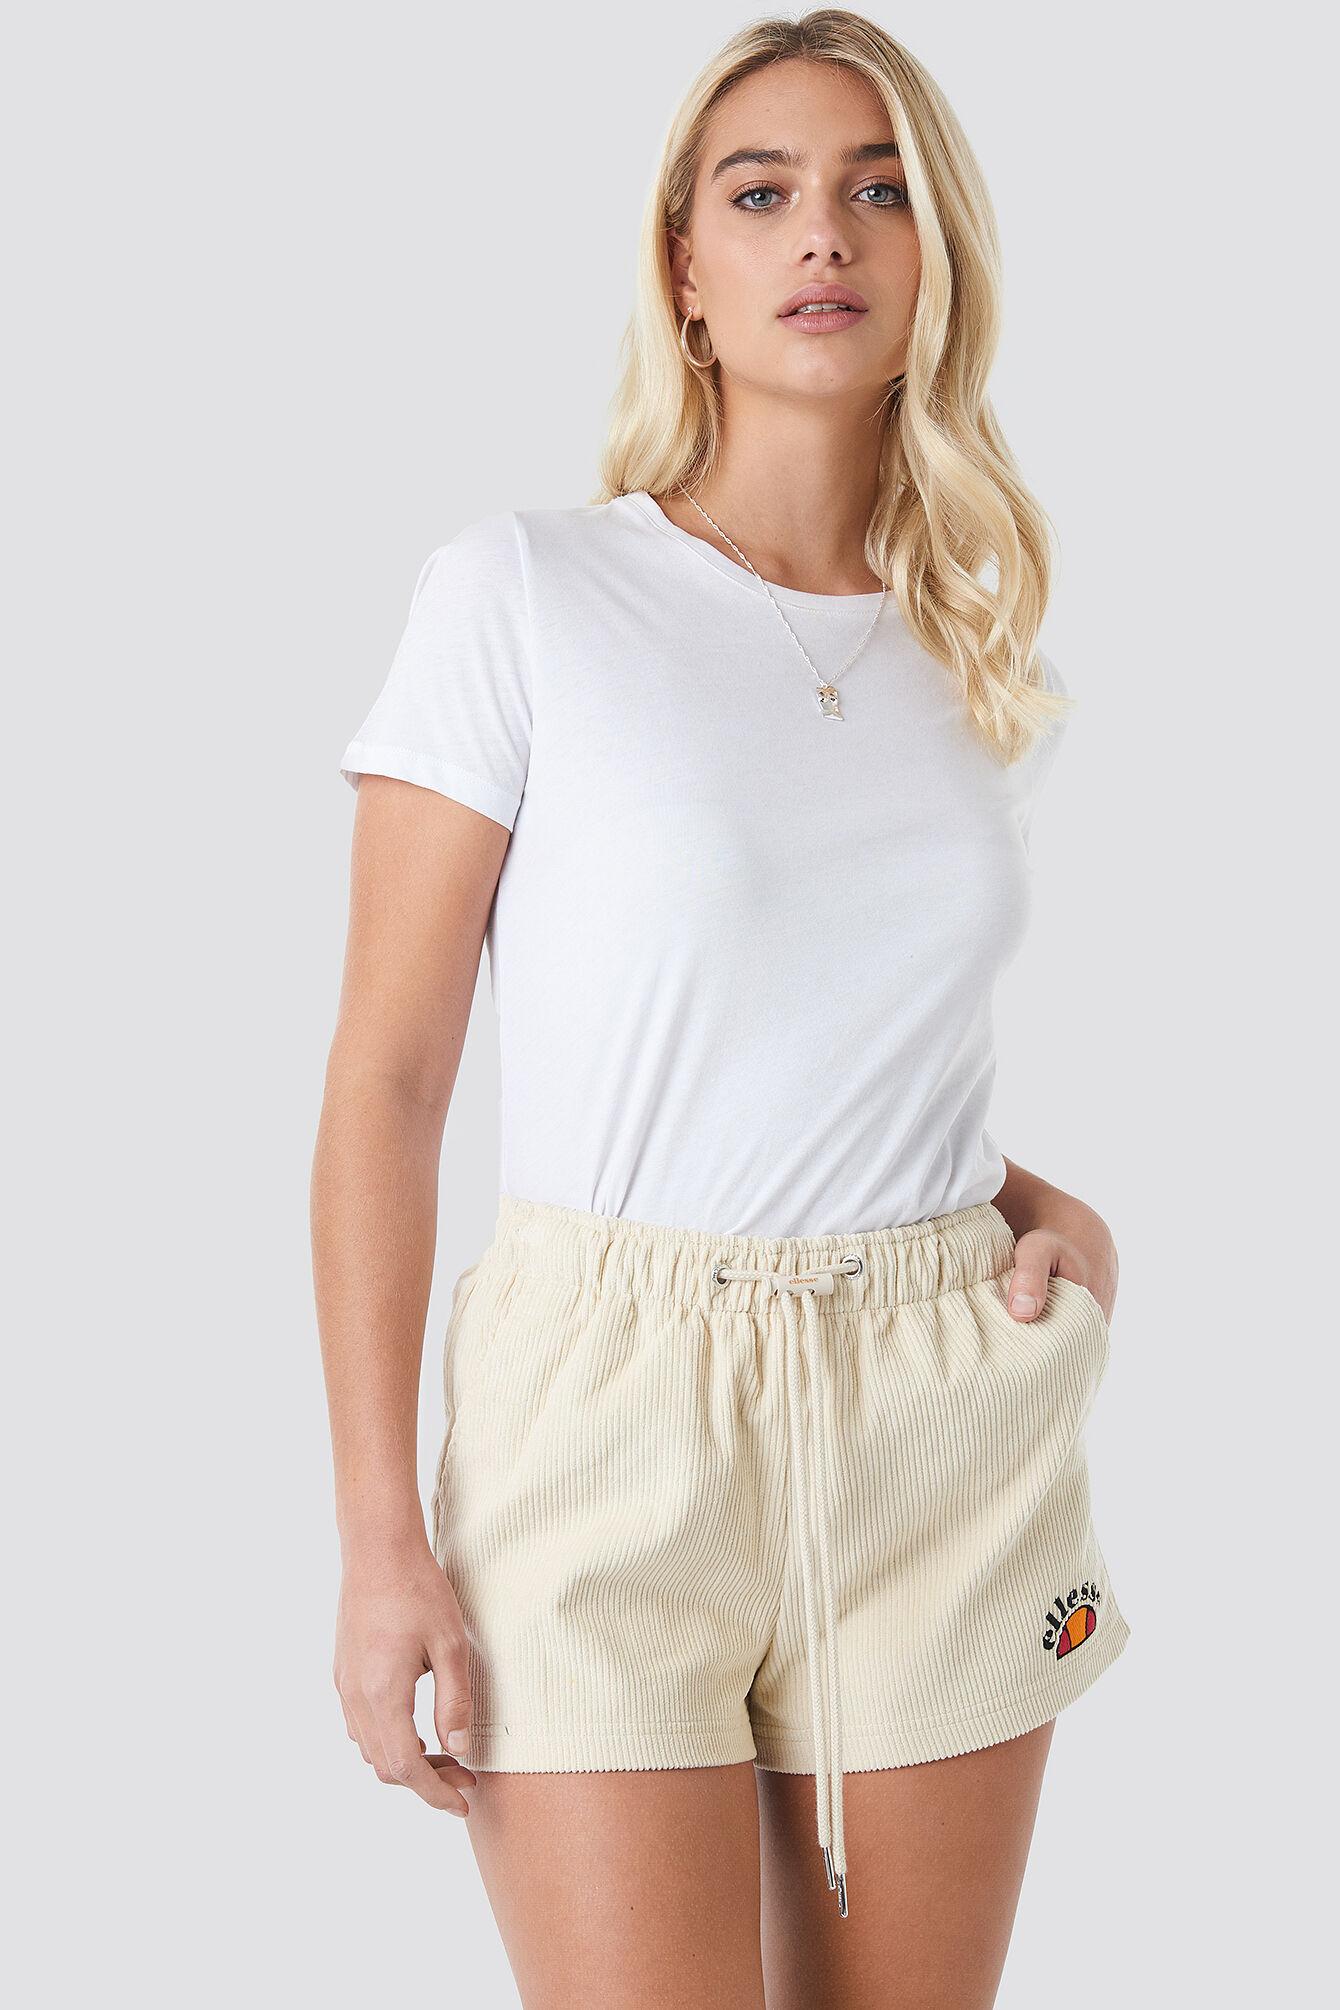 Ellesse El Frangipangi Short - White,Beige